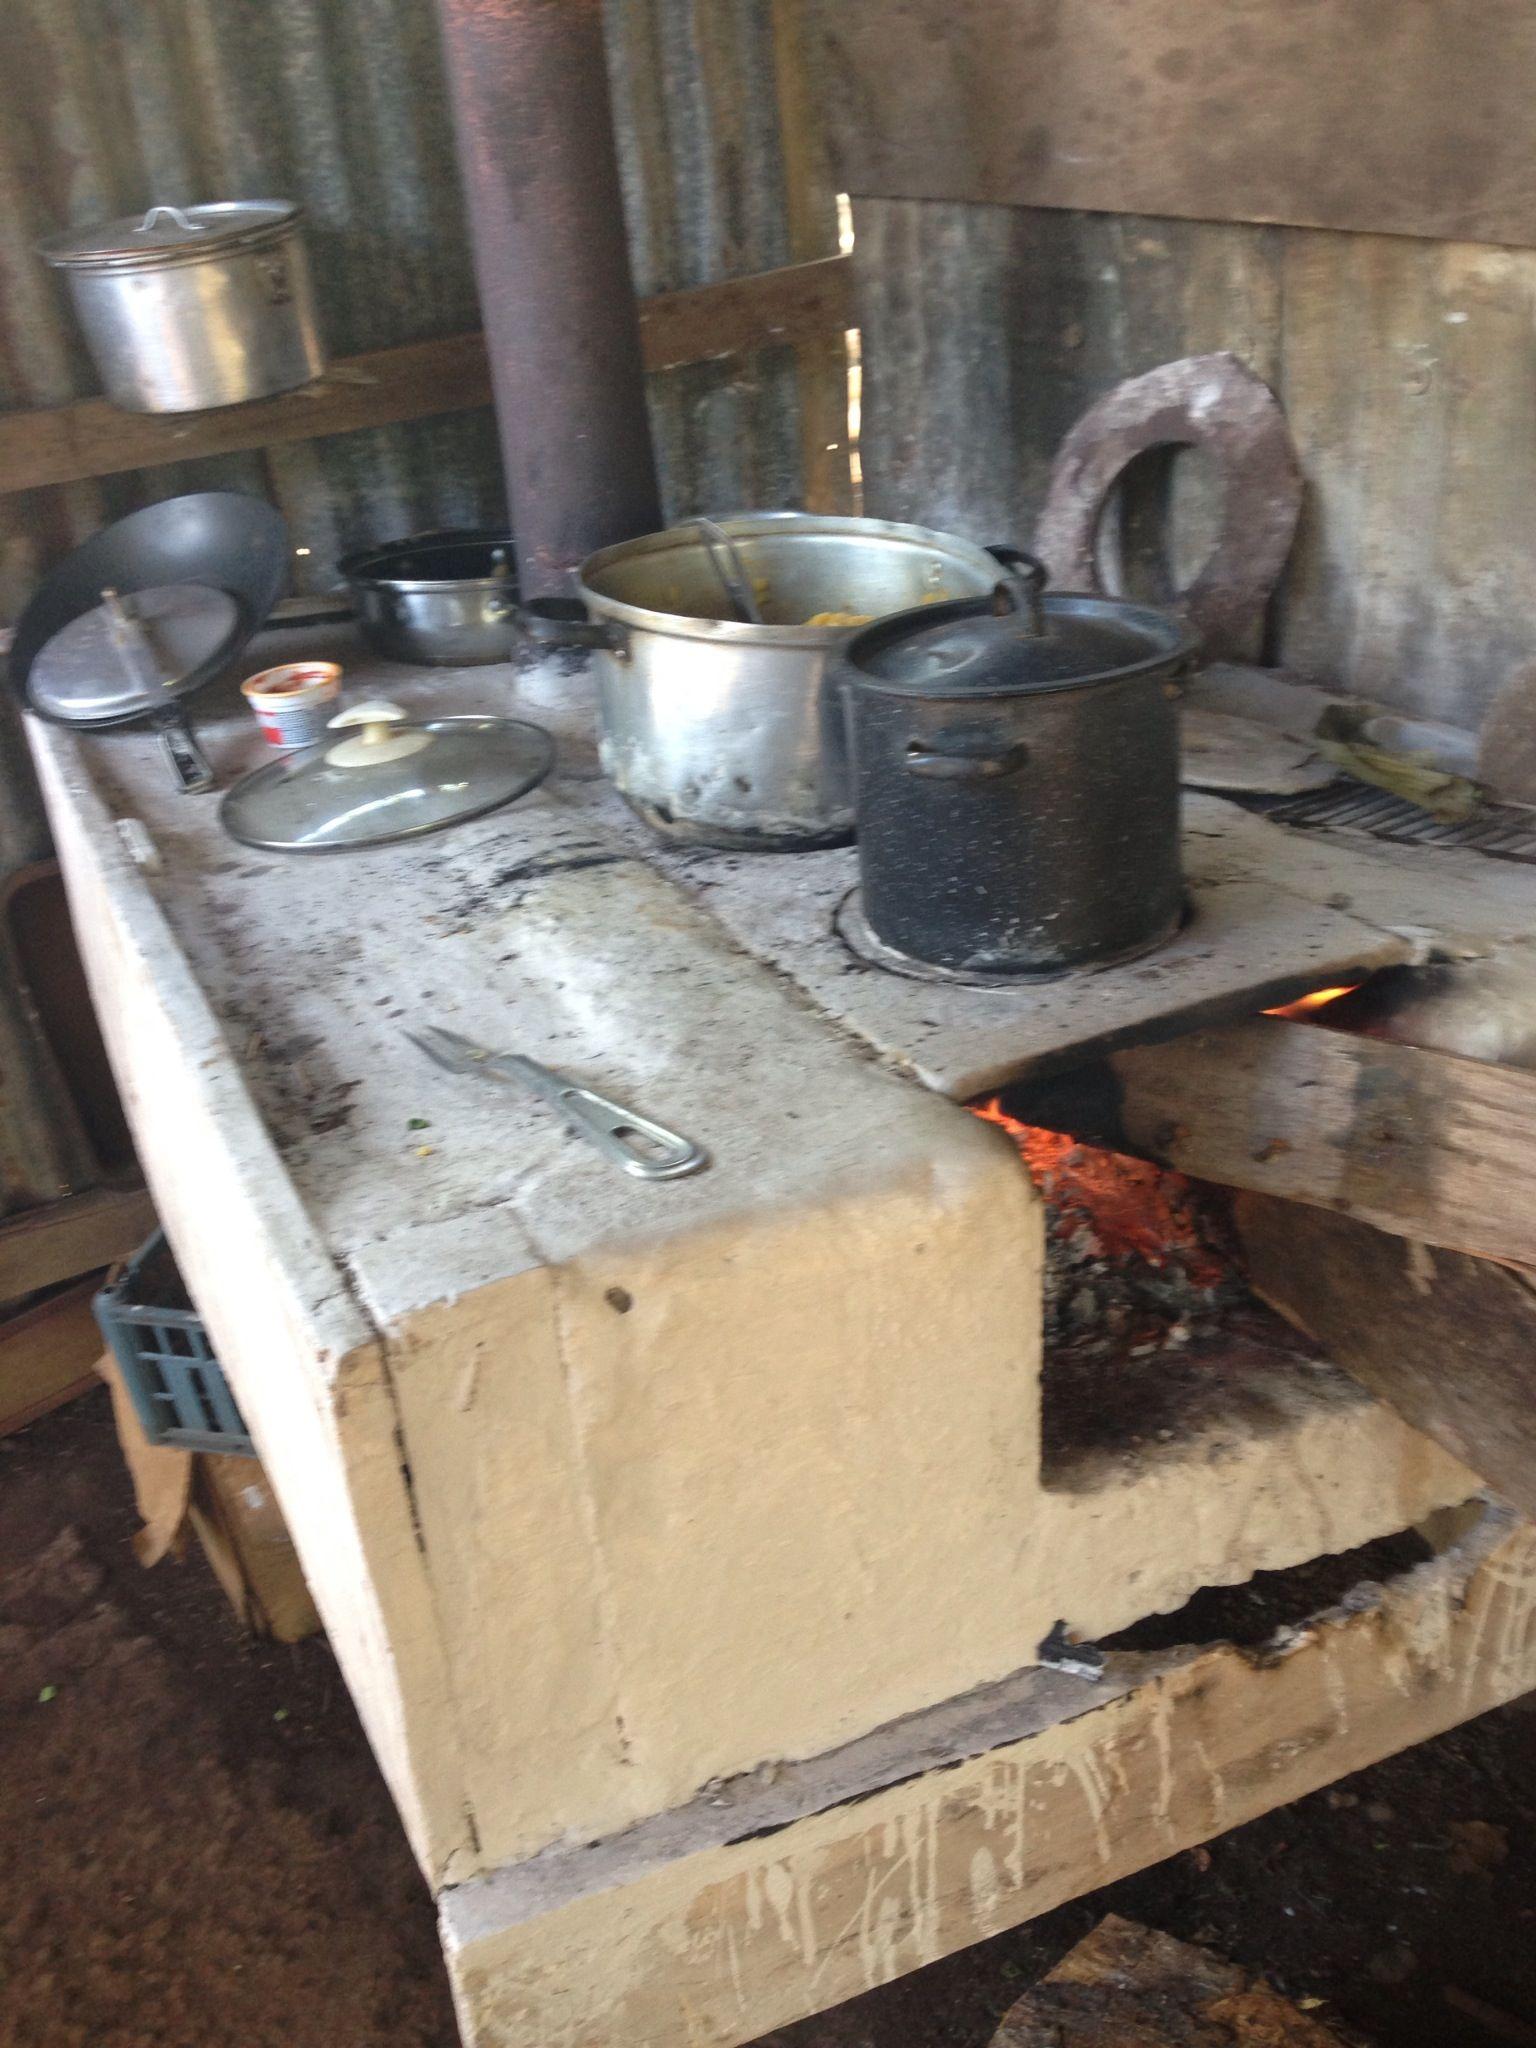 Cocina de le a de mi abuela cocina rustica pinterest - Cocinas de lena ...